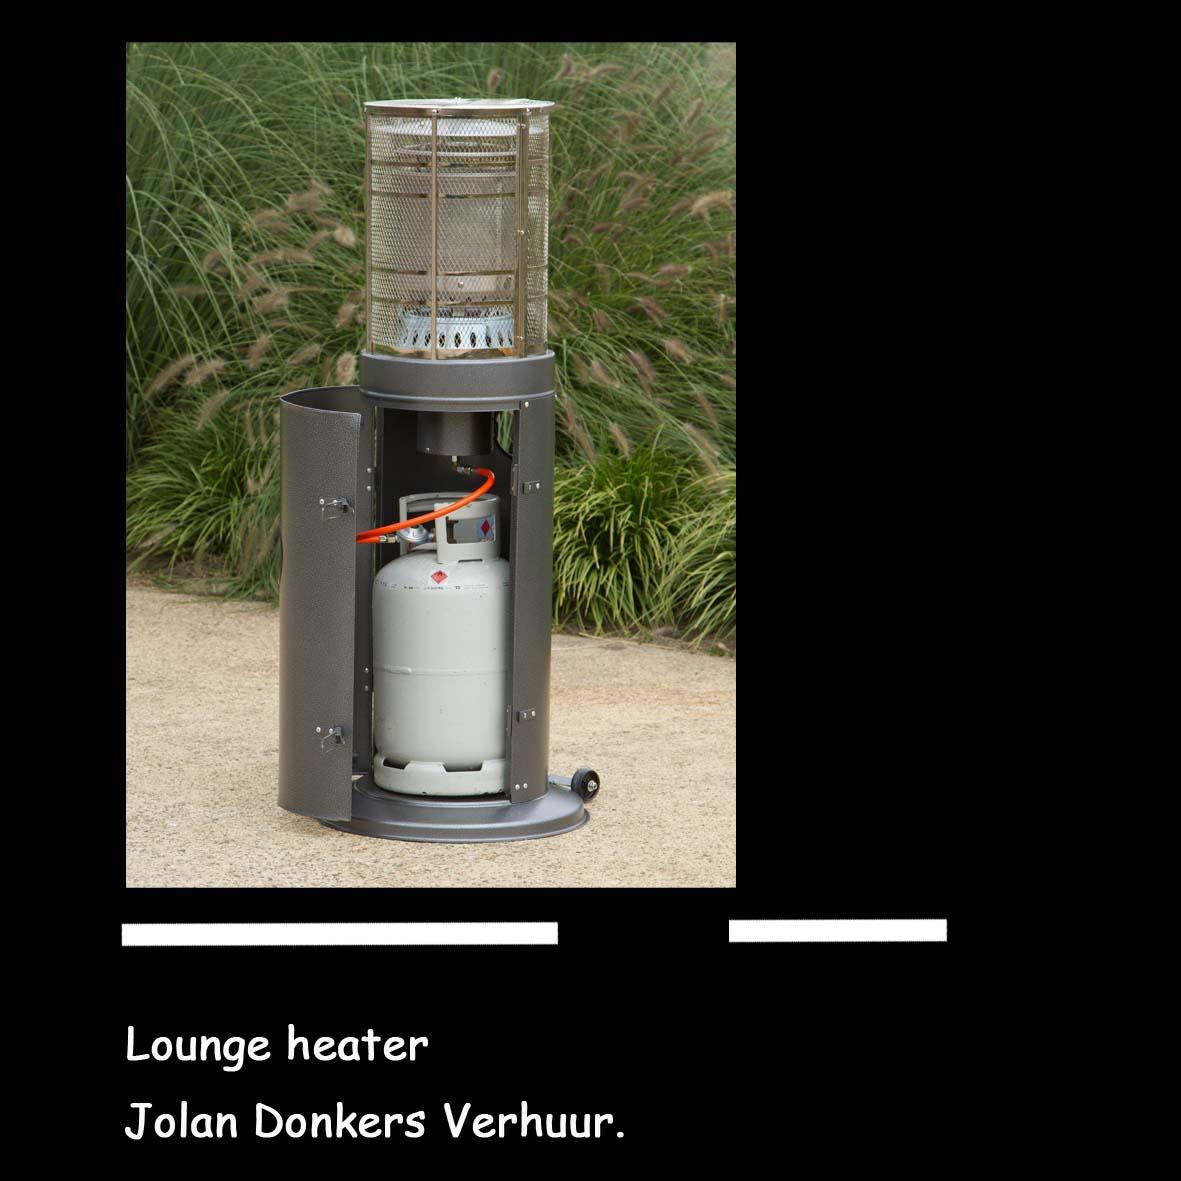 Lounge heater